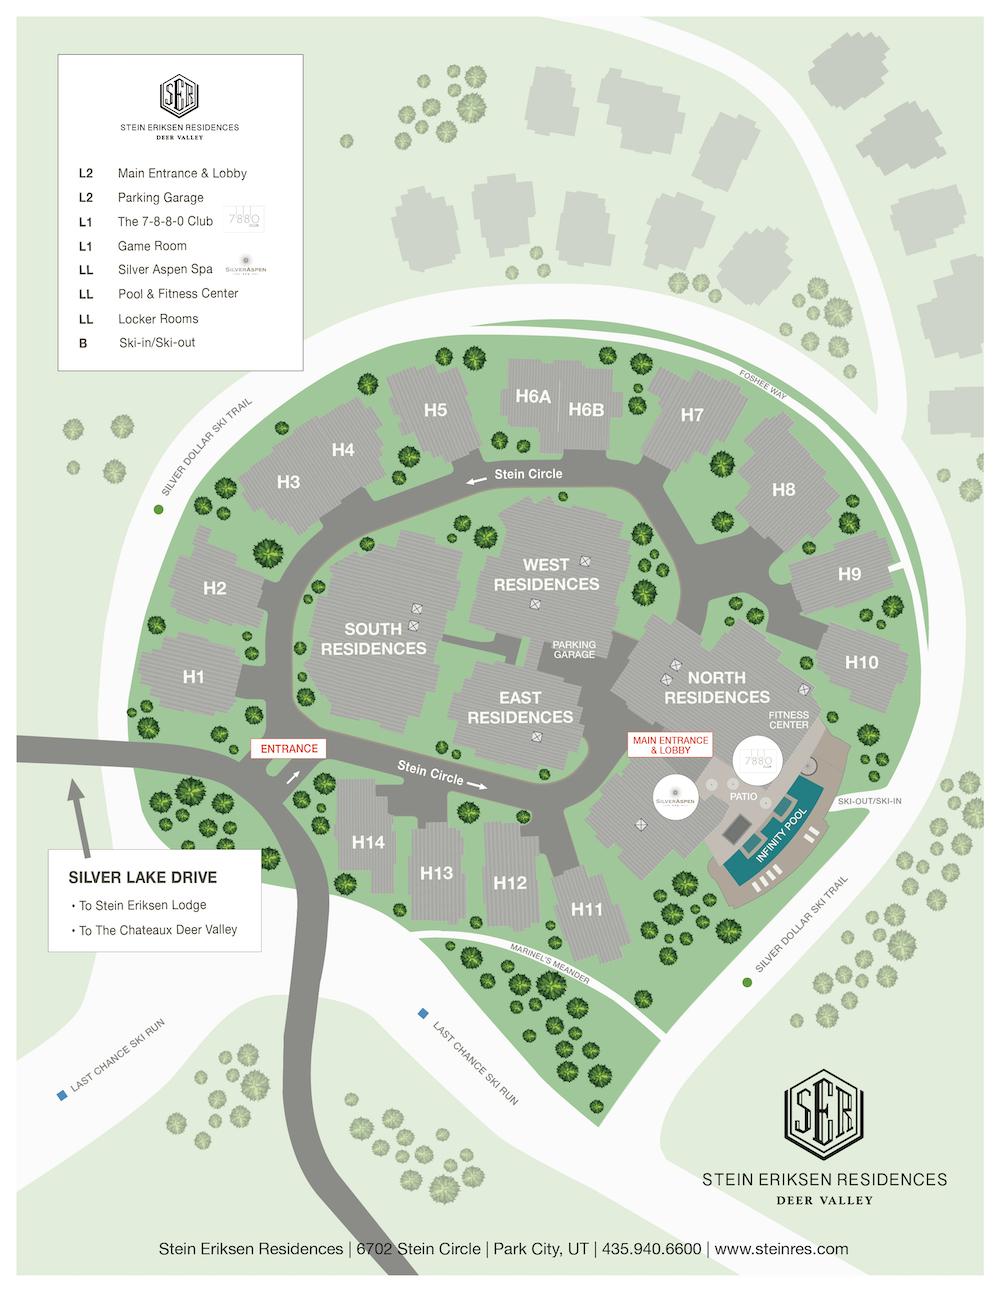 Stein Eriksen Residences Property Map